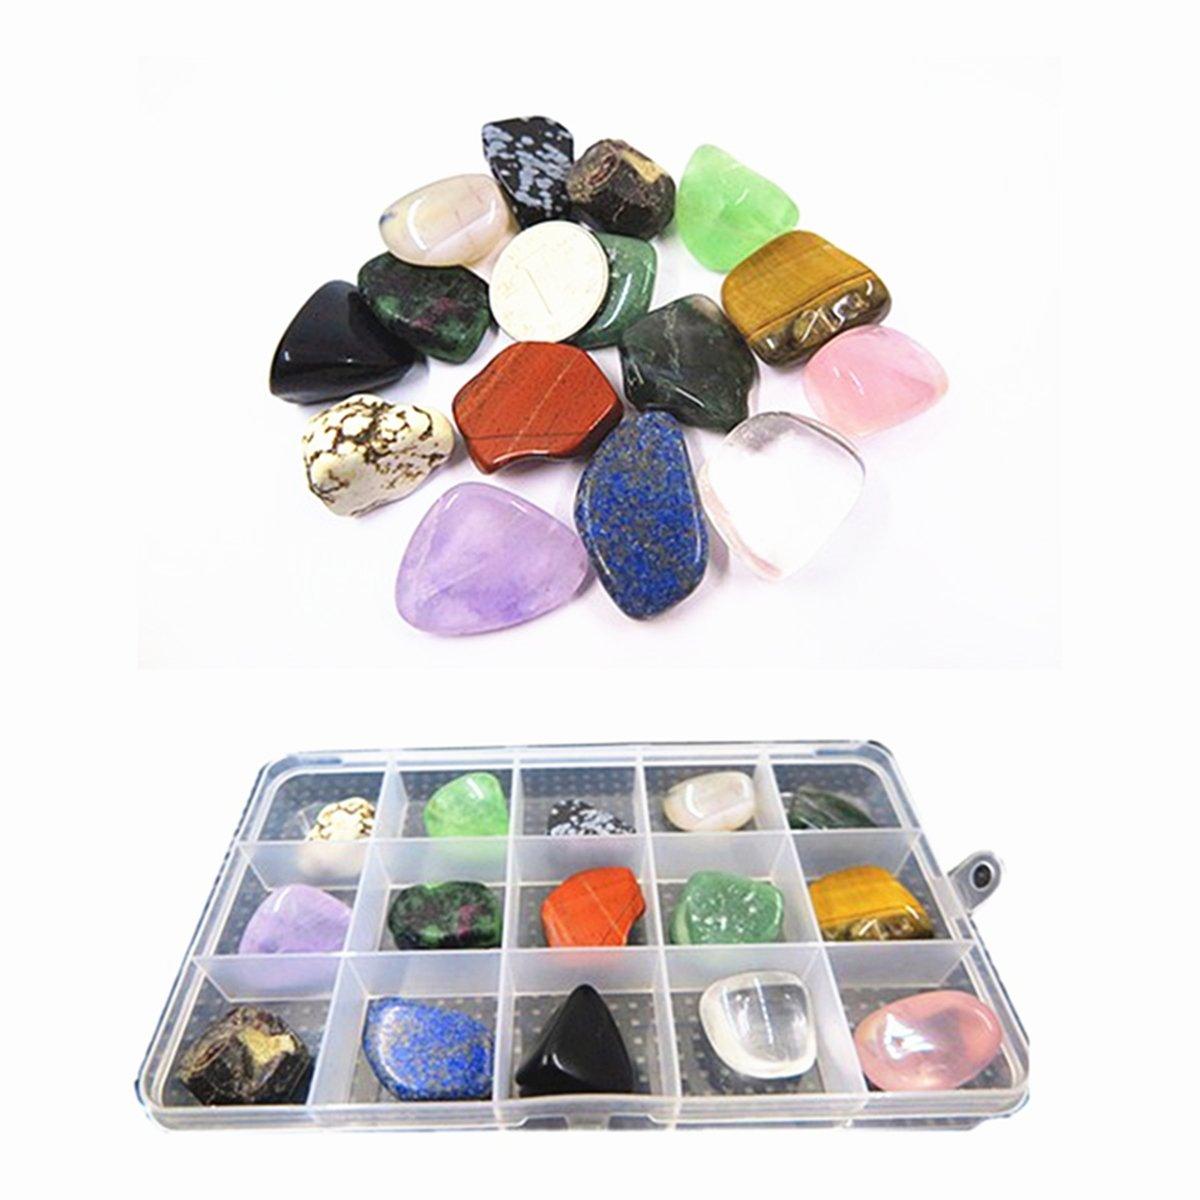 YIEASDA 15-Stone Mixed Crystals Kit, Healing Chakra Nature Rocks Stones for Reiki Meditation Rituals Spiritual Metaphysical Home Decor Teaching by YIEASDA